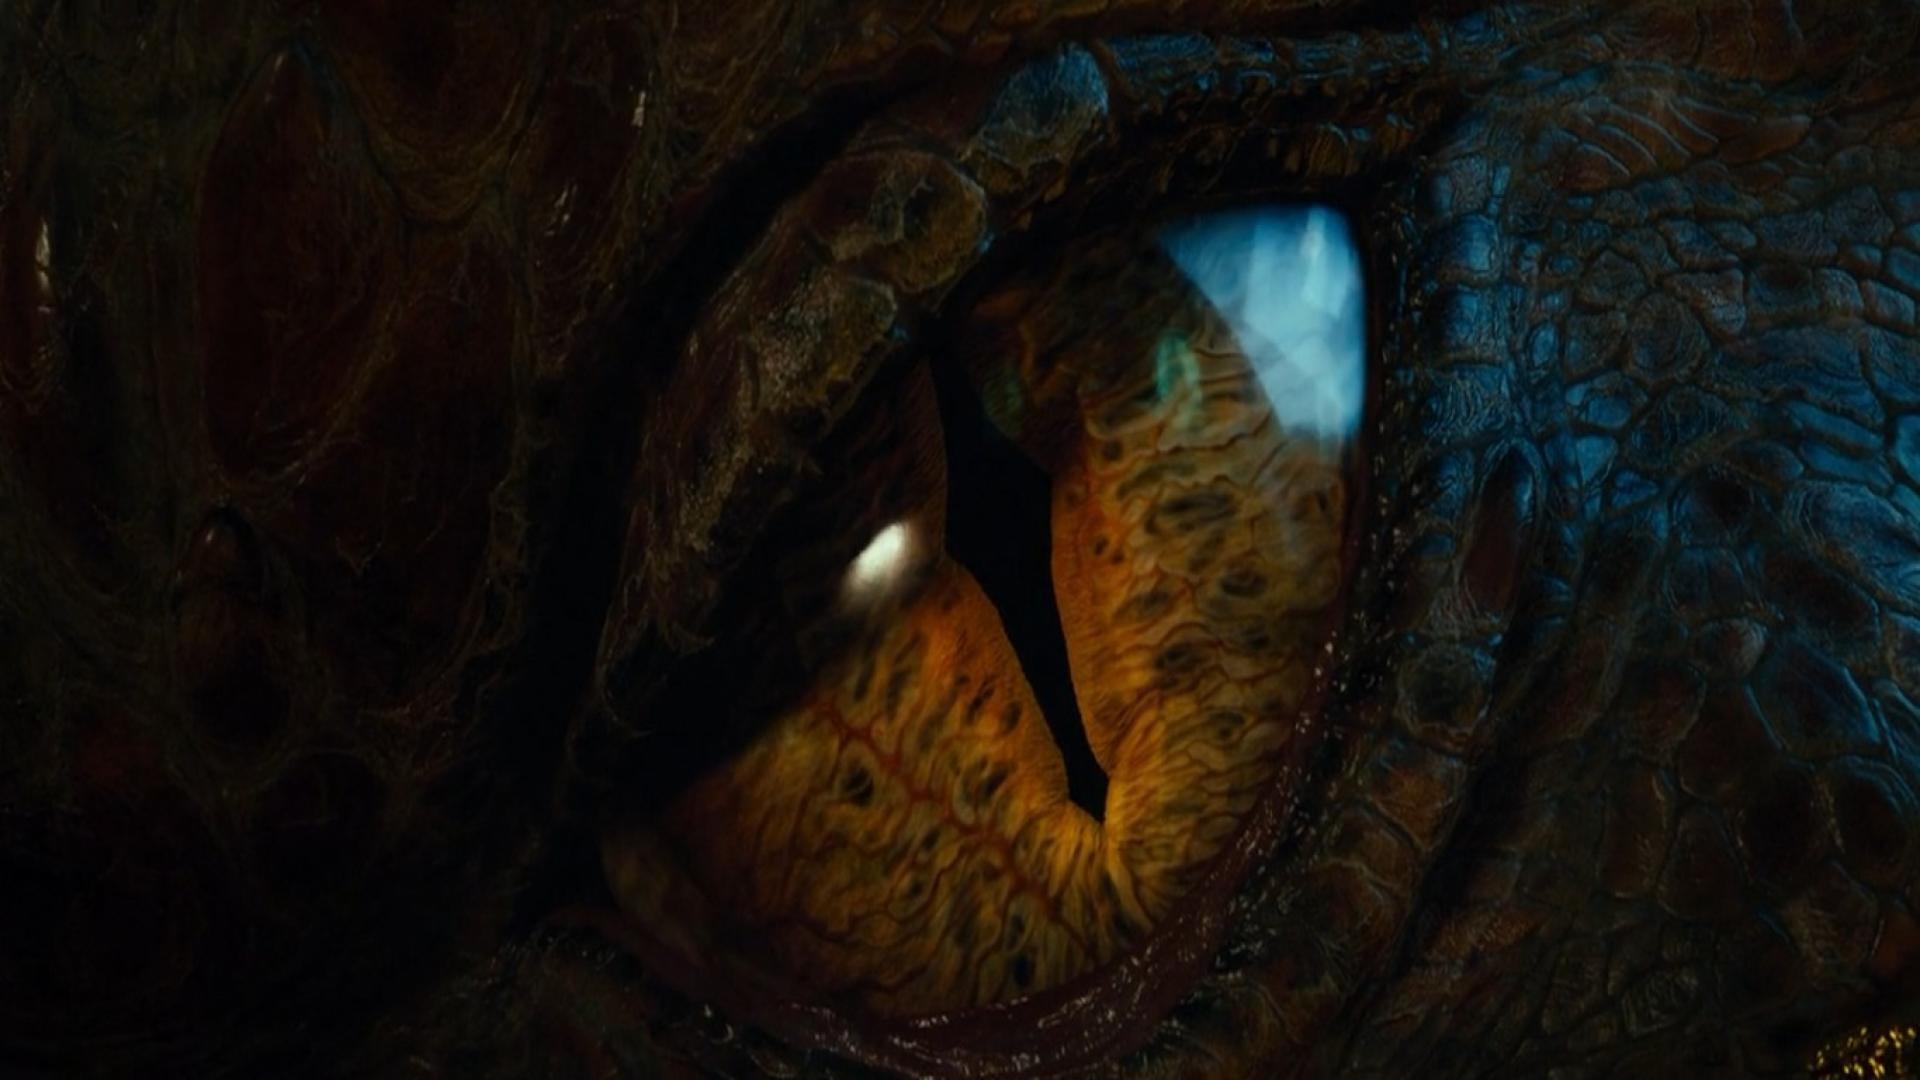 Eyes dragons the hobbit smaug wallpaper | (64877)